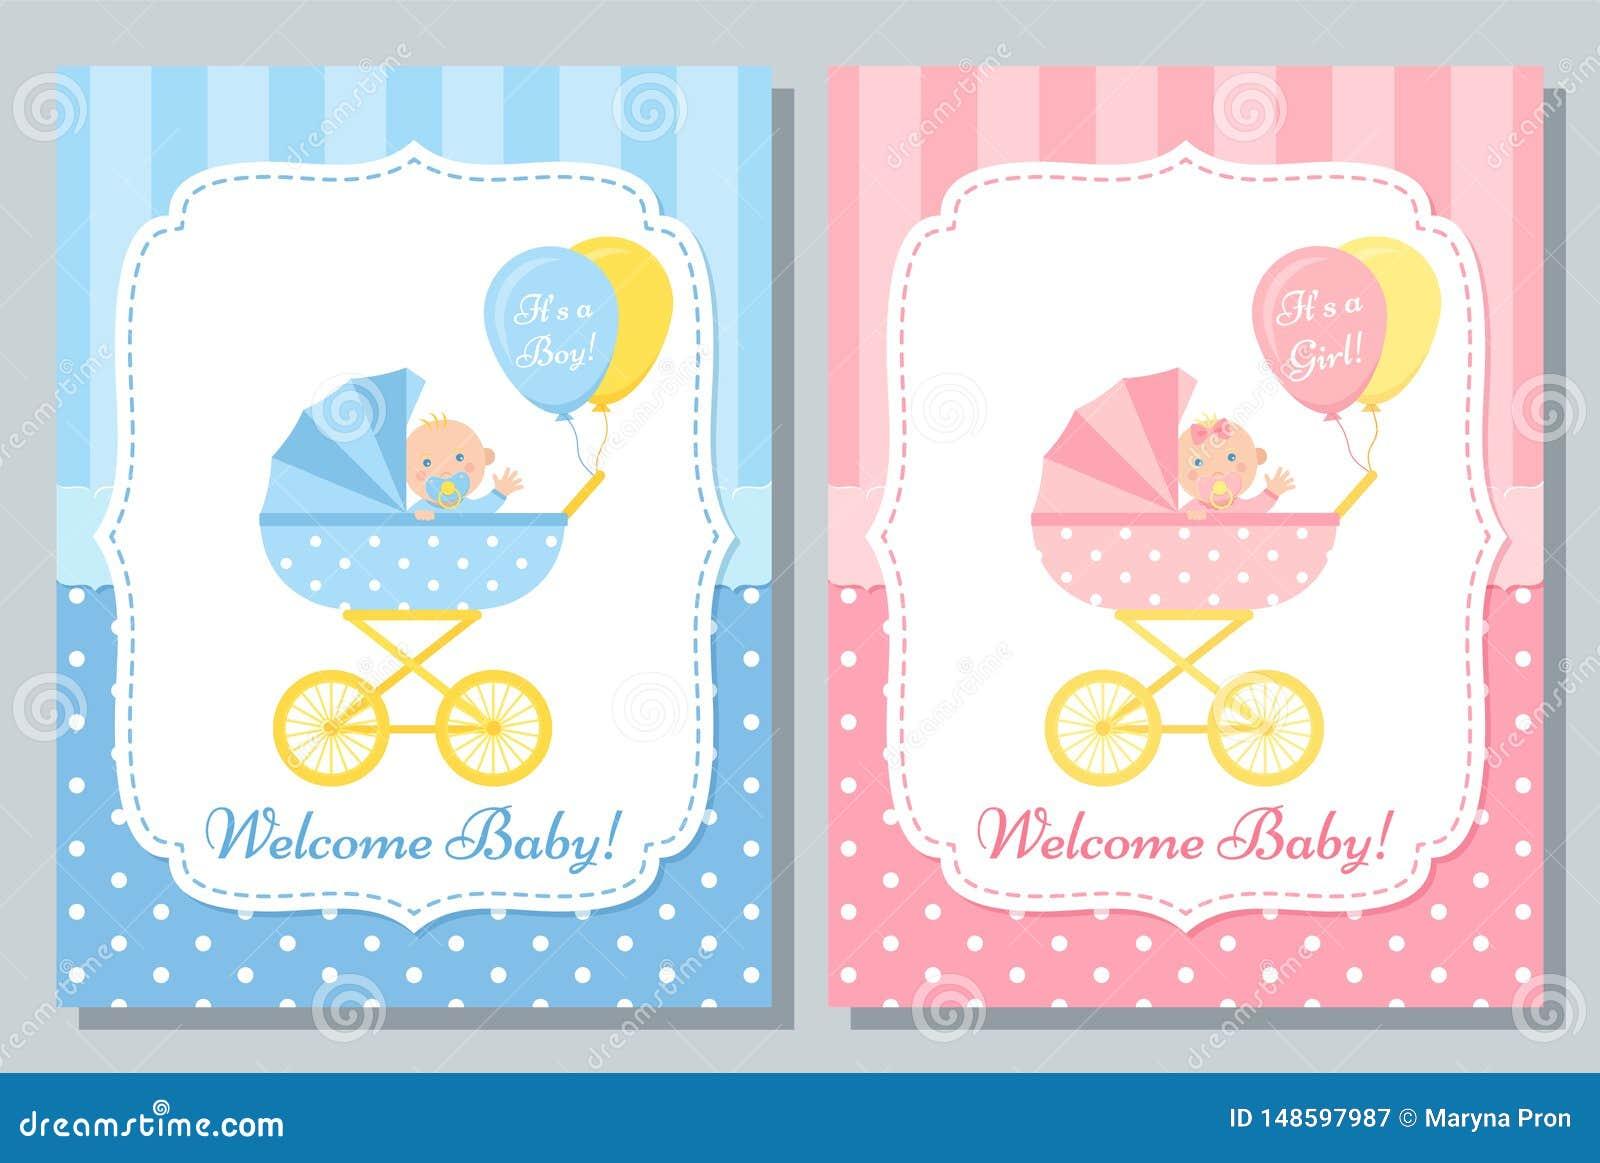 Baby Shower Card Design Vector Illustration Birthday Template Invite Stock Vector Illustration Of Announcement Flyer 148597987